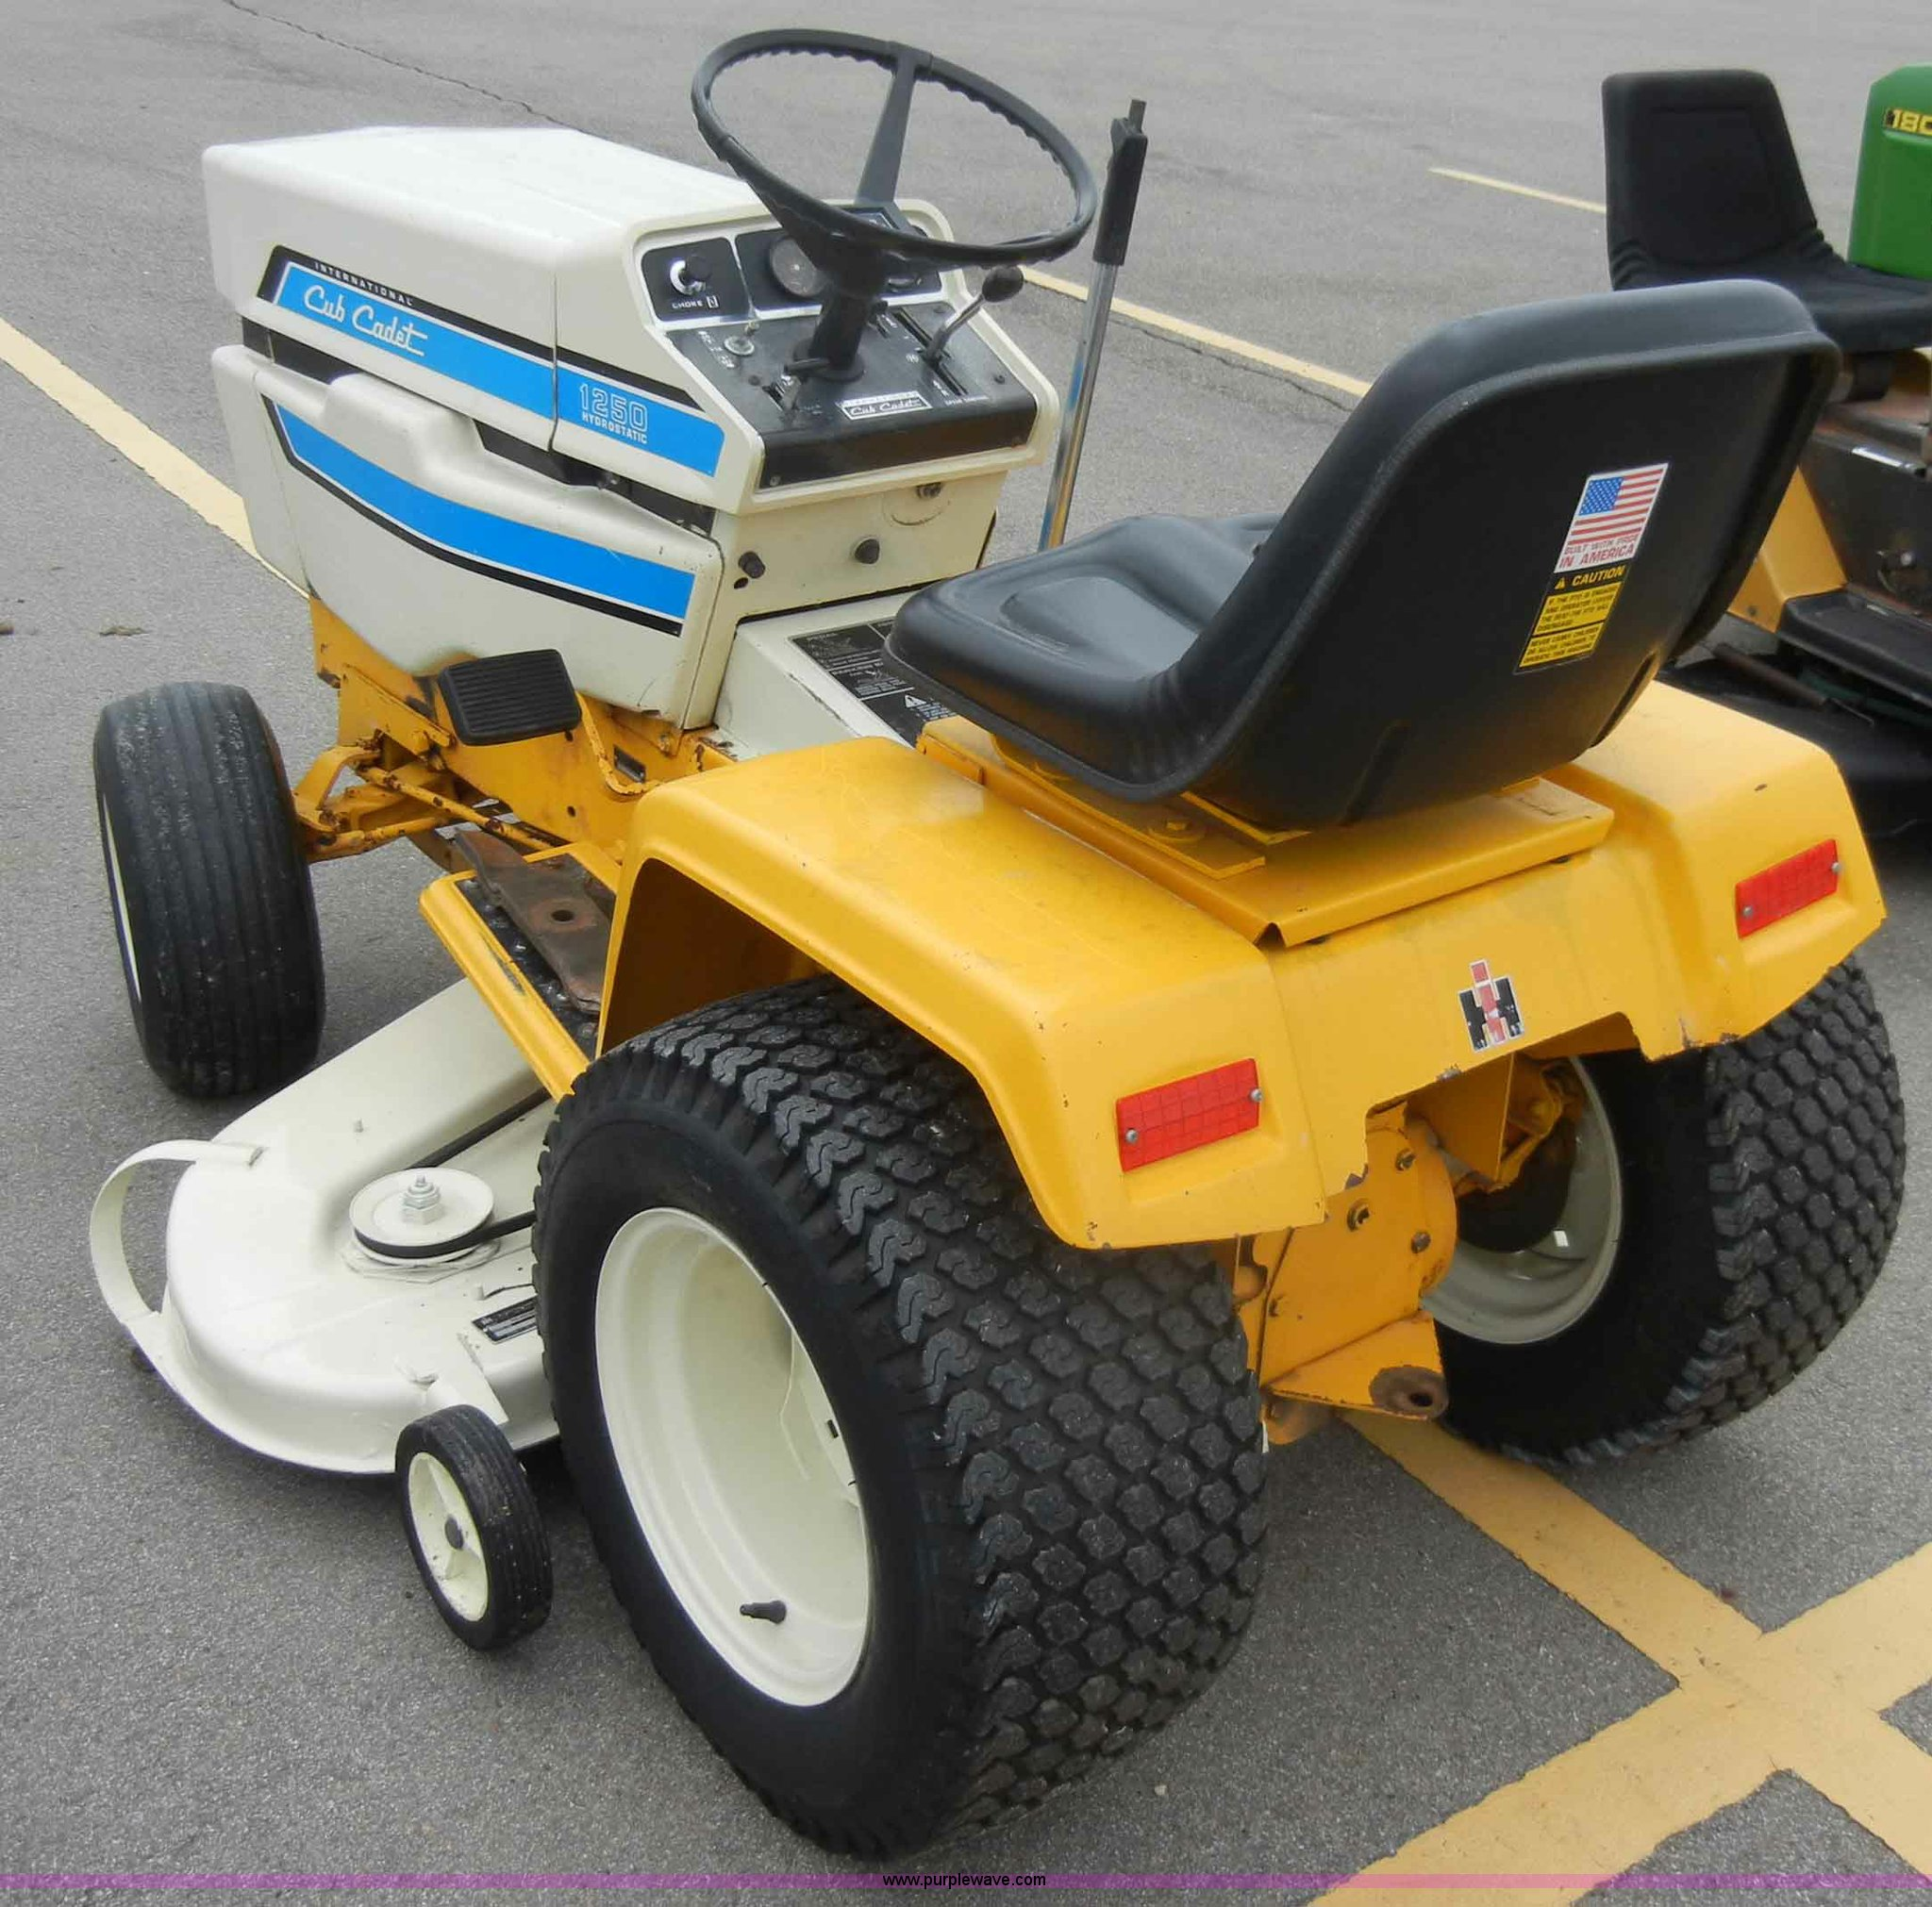 Cub Cadet 1250 lawn mower | Item C4116 | SOLD! March 7 Midwe